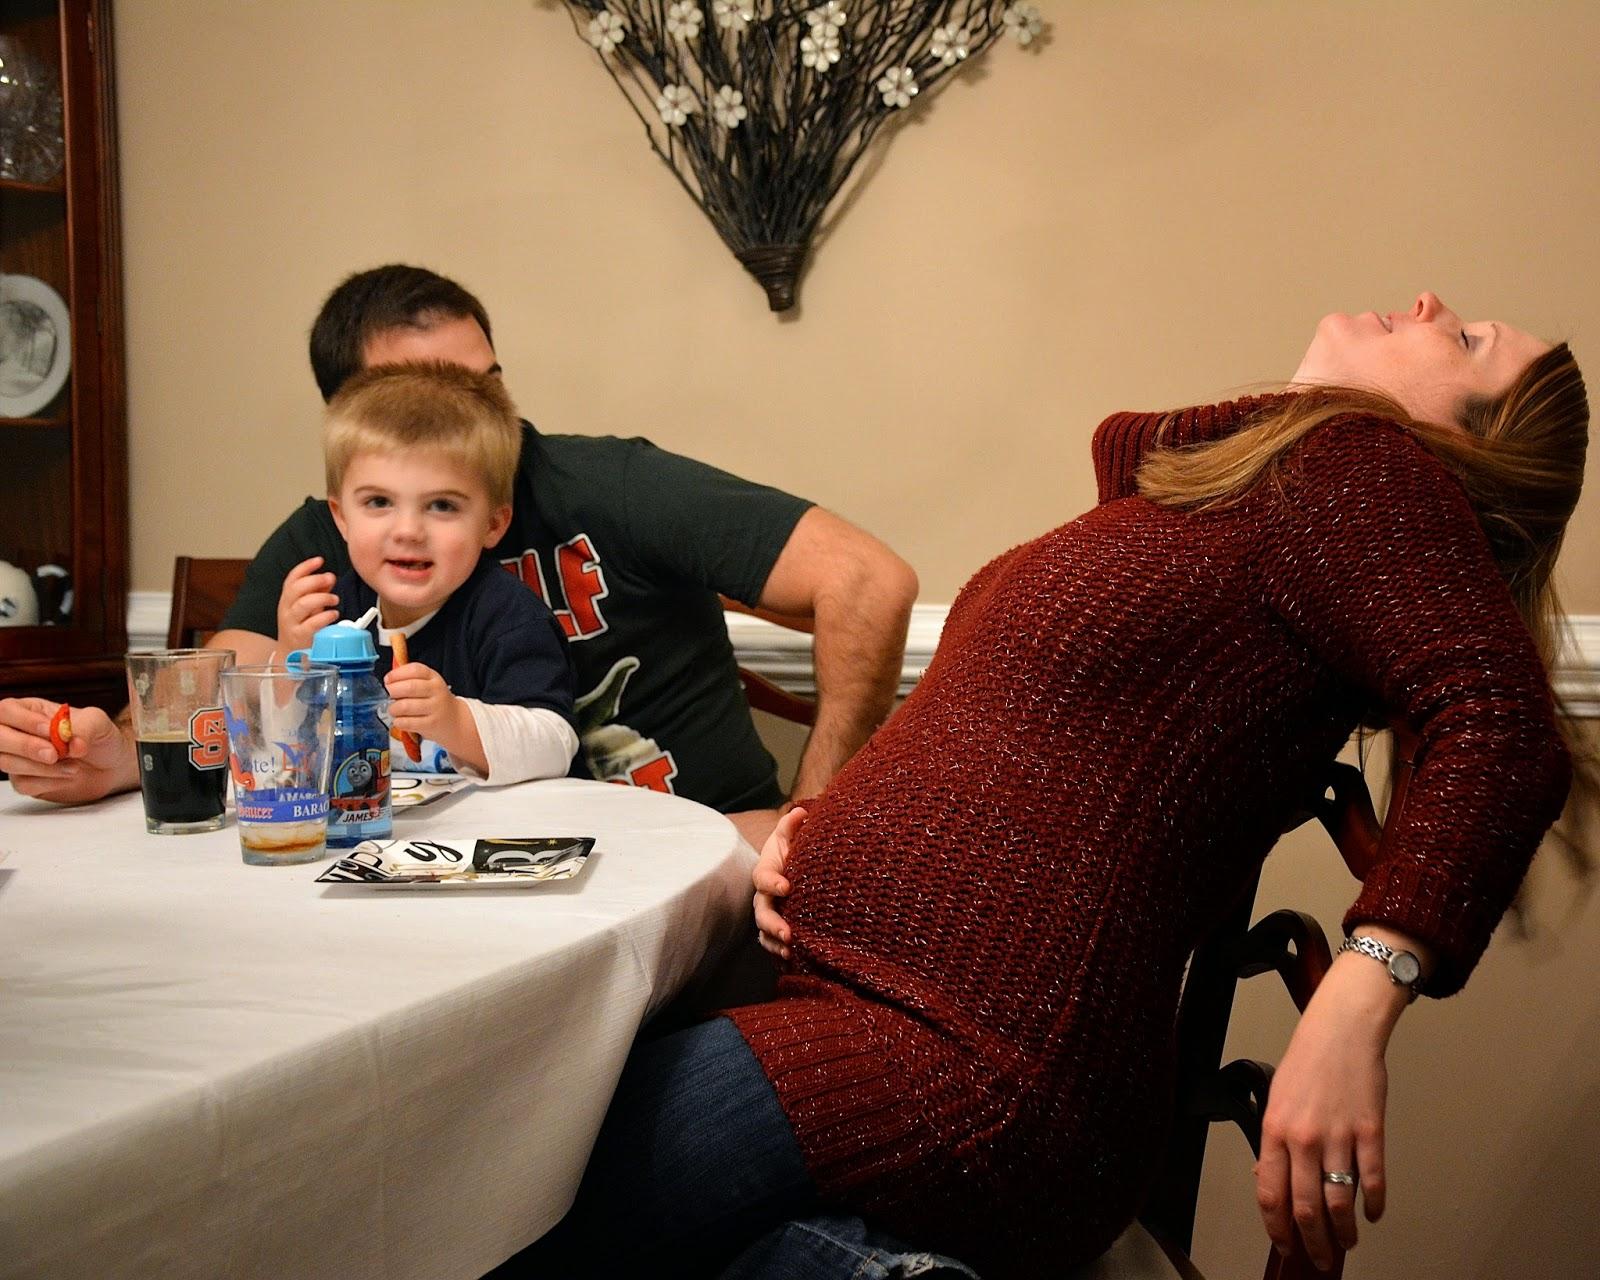 Kristen, Stephen, and Nicholas around the dinner table